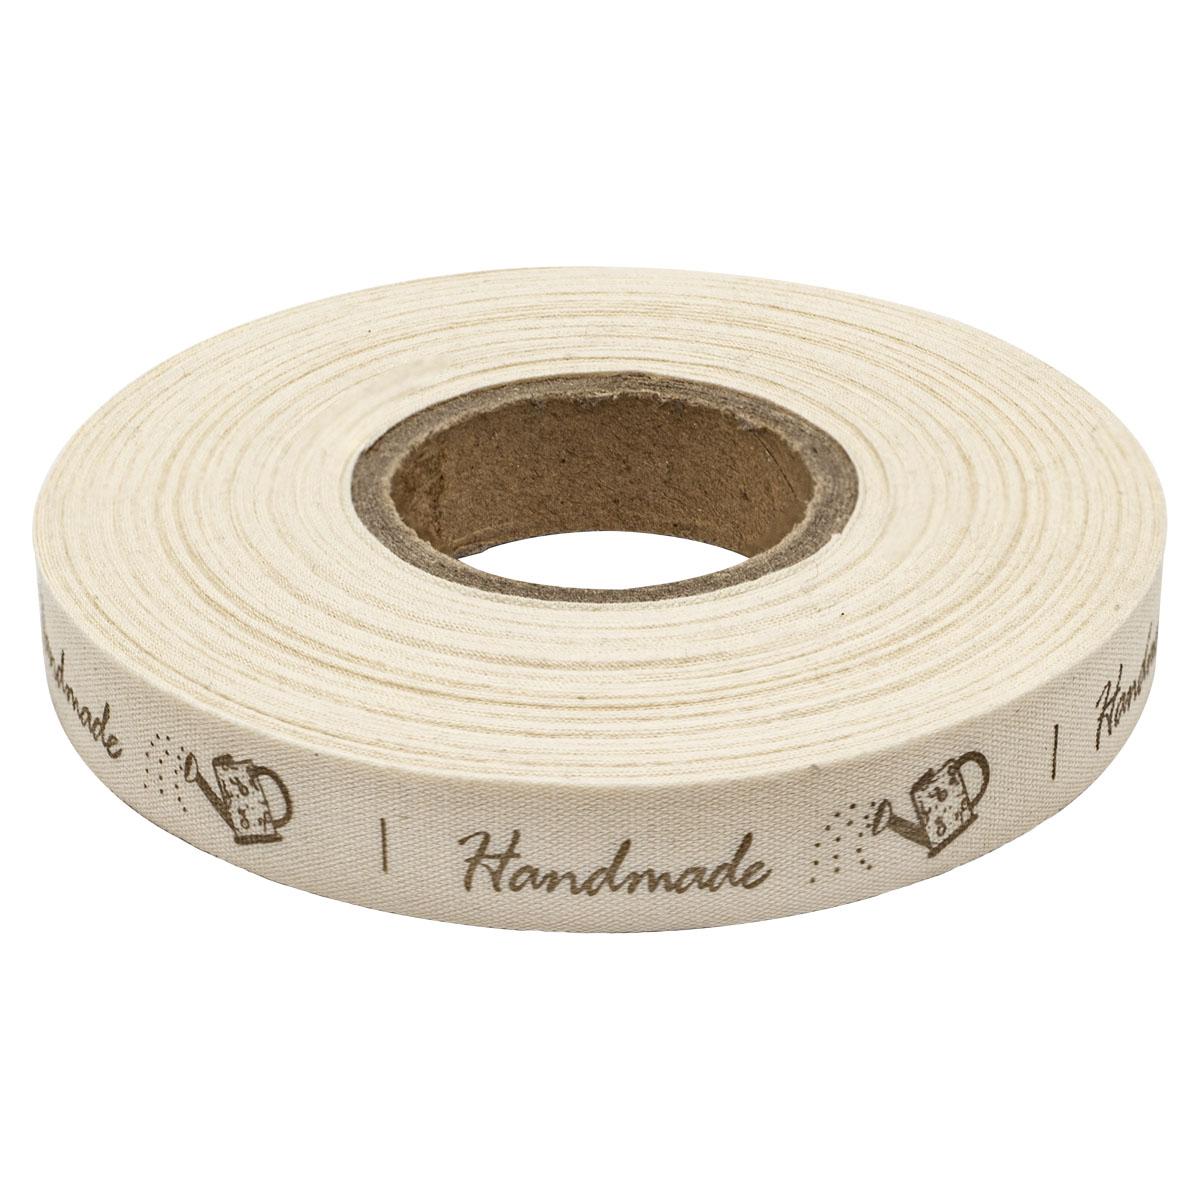 3AR117-1 Лента декоративная 'HandMade' 100% хб 15мм*25 м